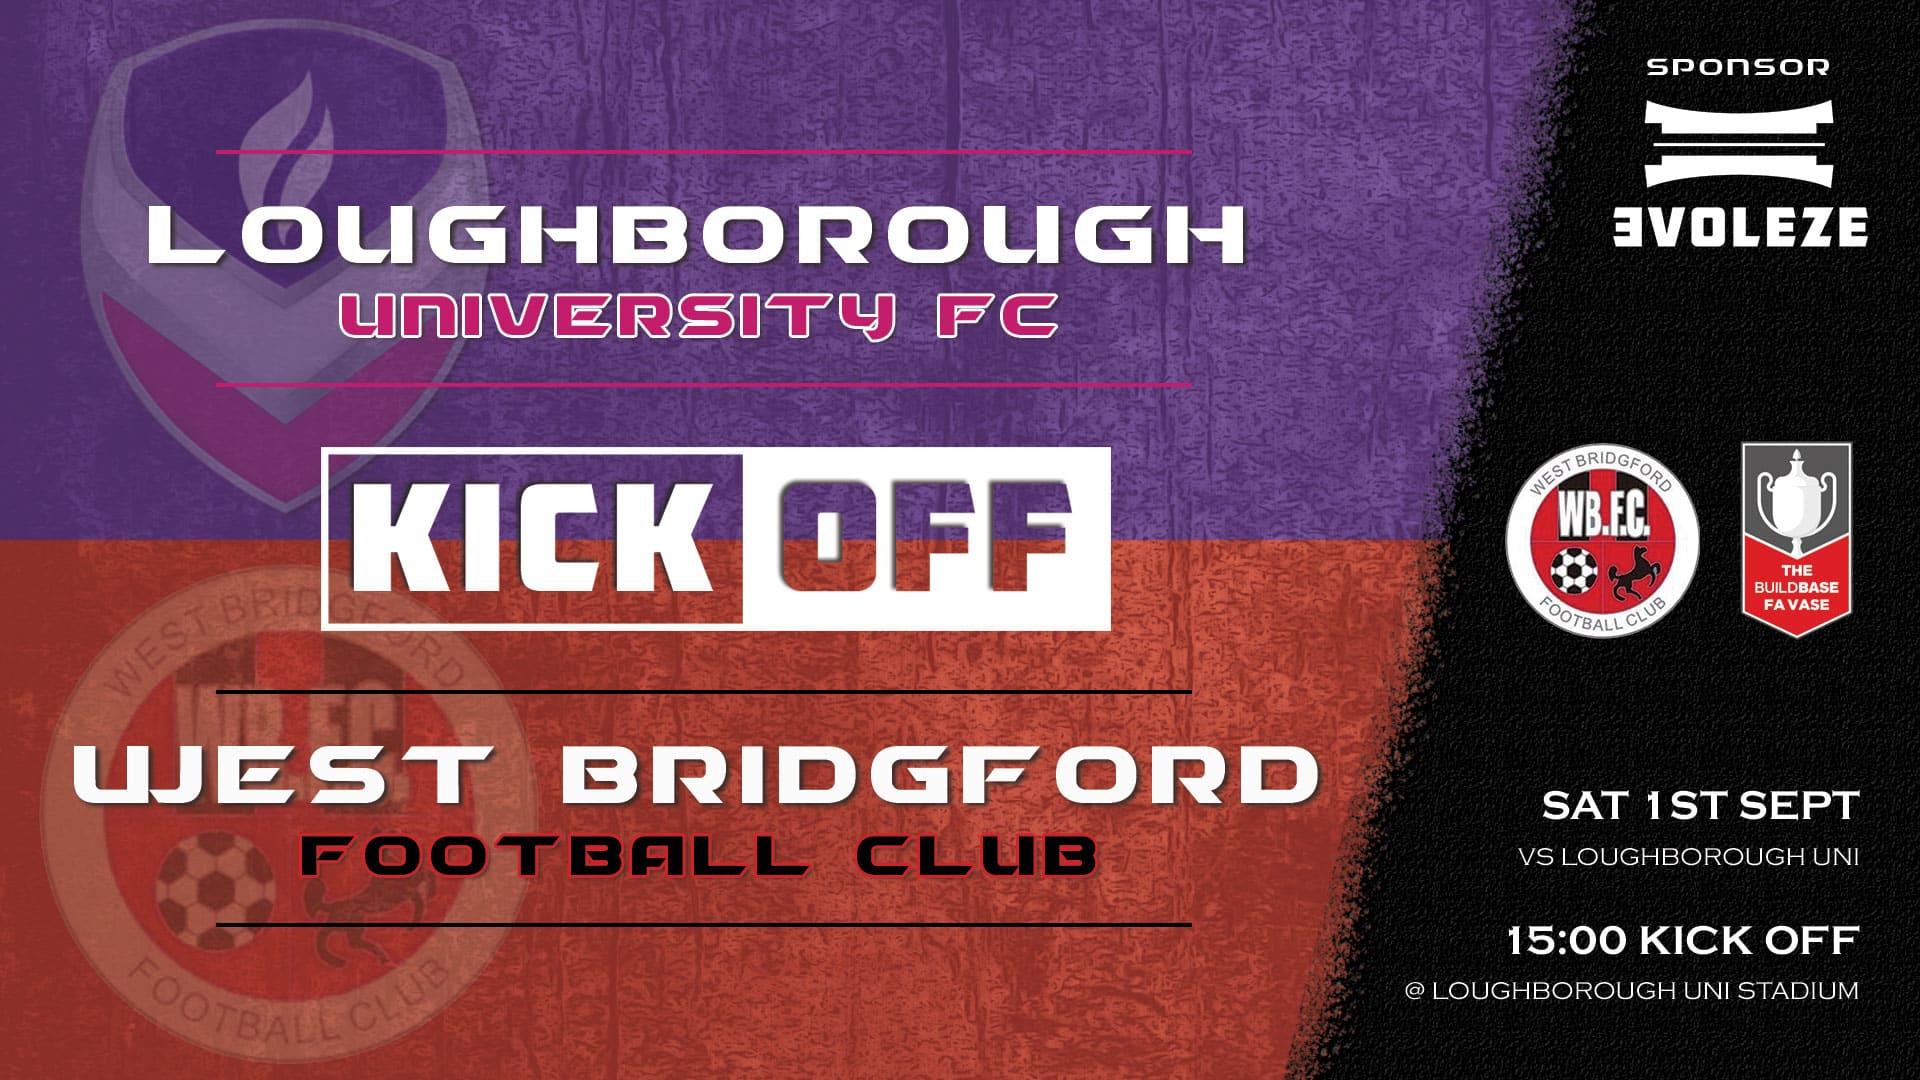 kick off - West Bridgford FC